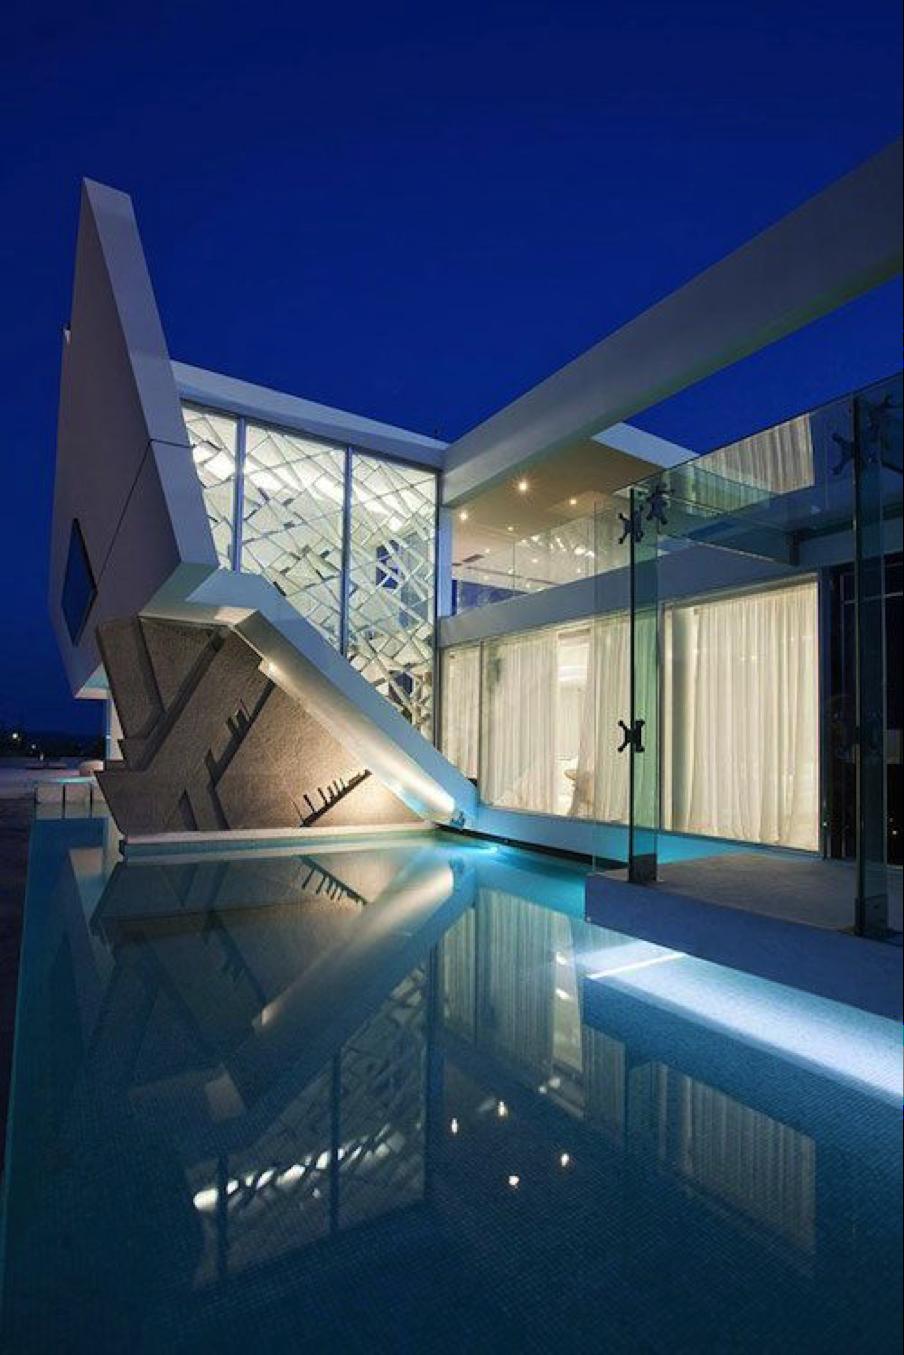 Iluminación arquitectural para la piscina